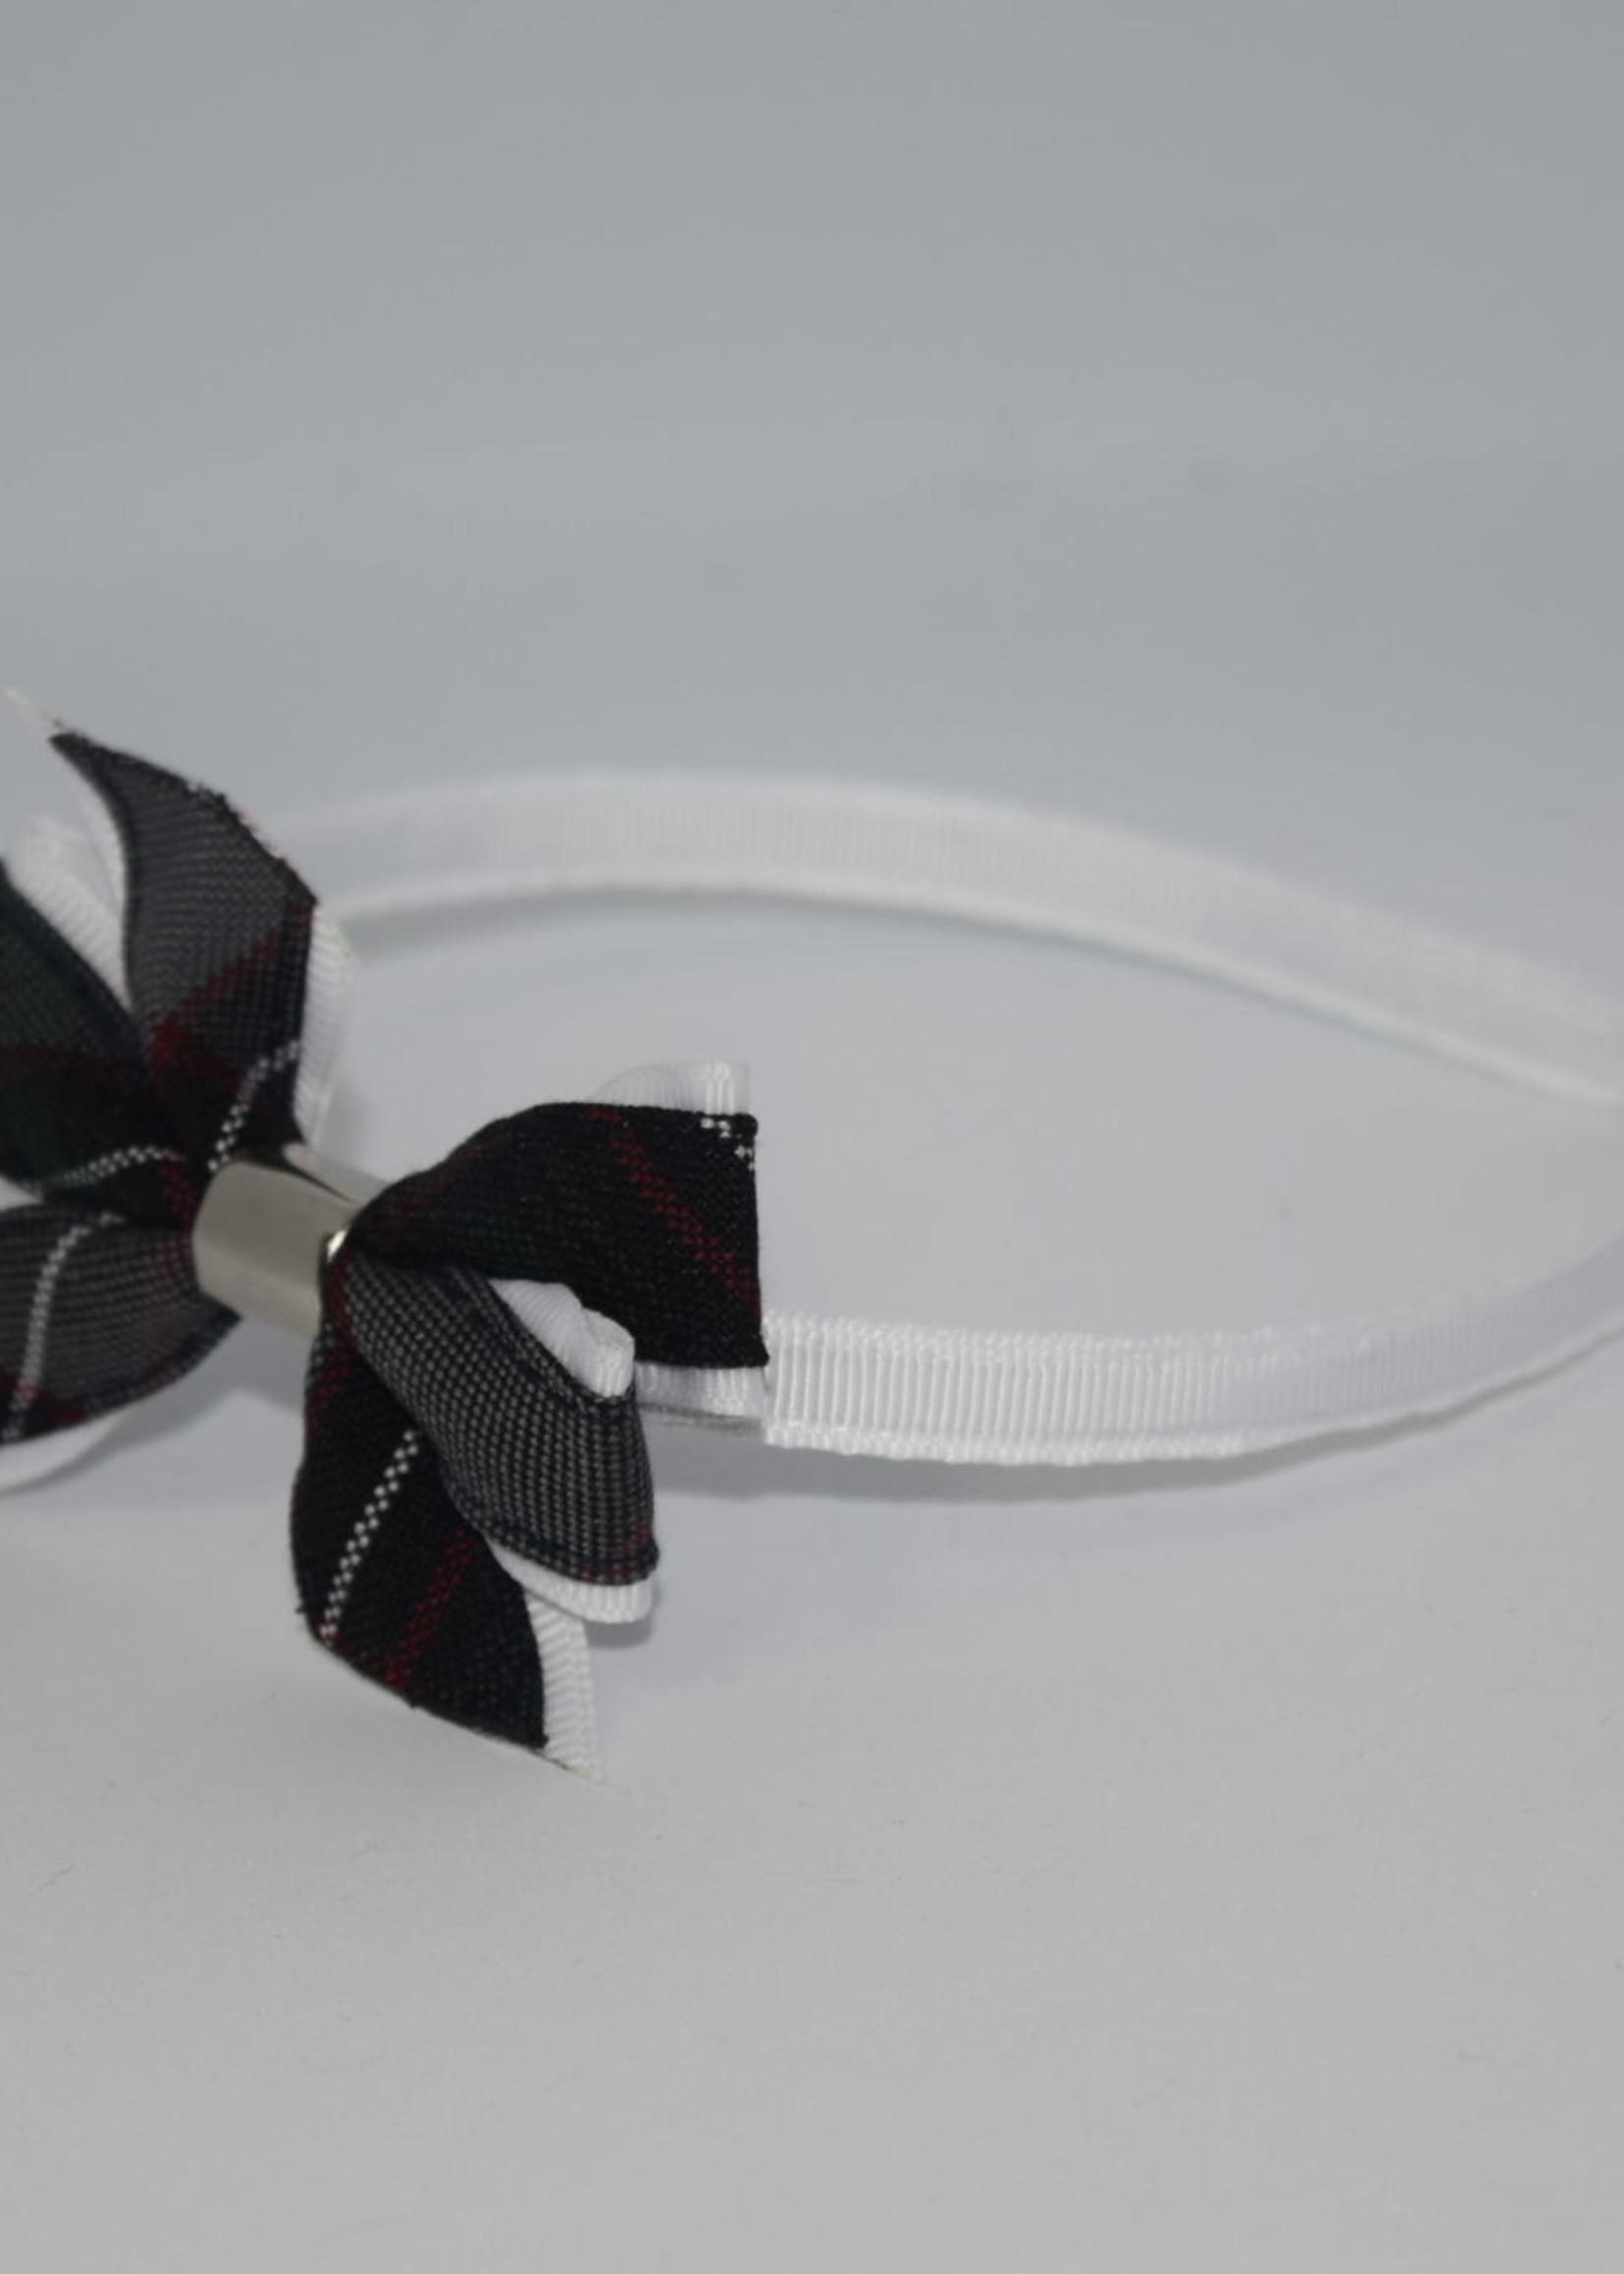 Mini Monarch Bow on covered Headband P26